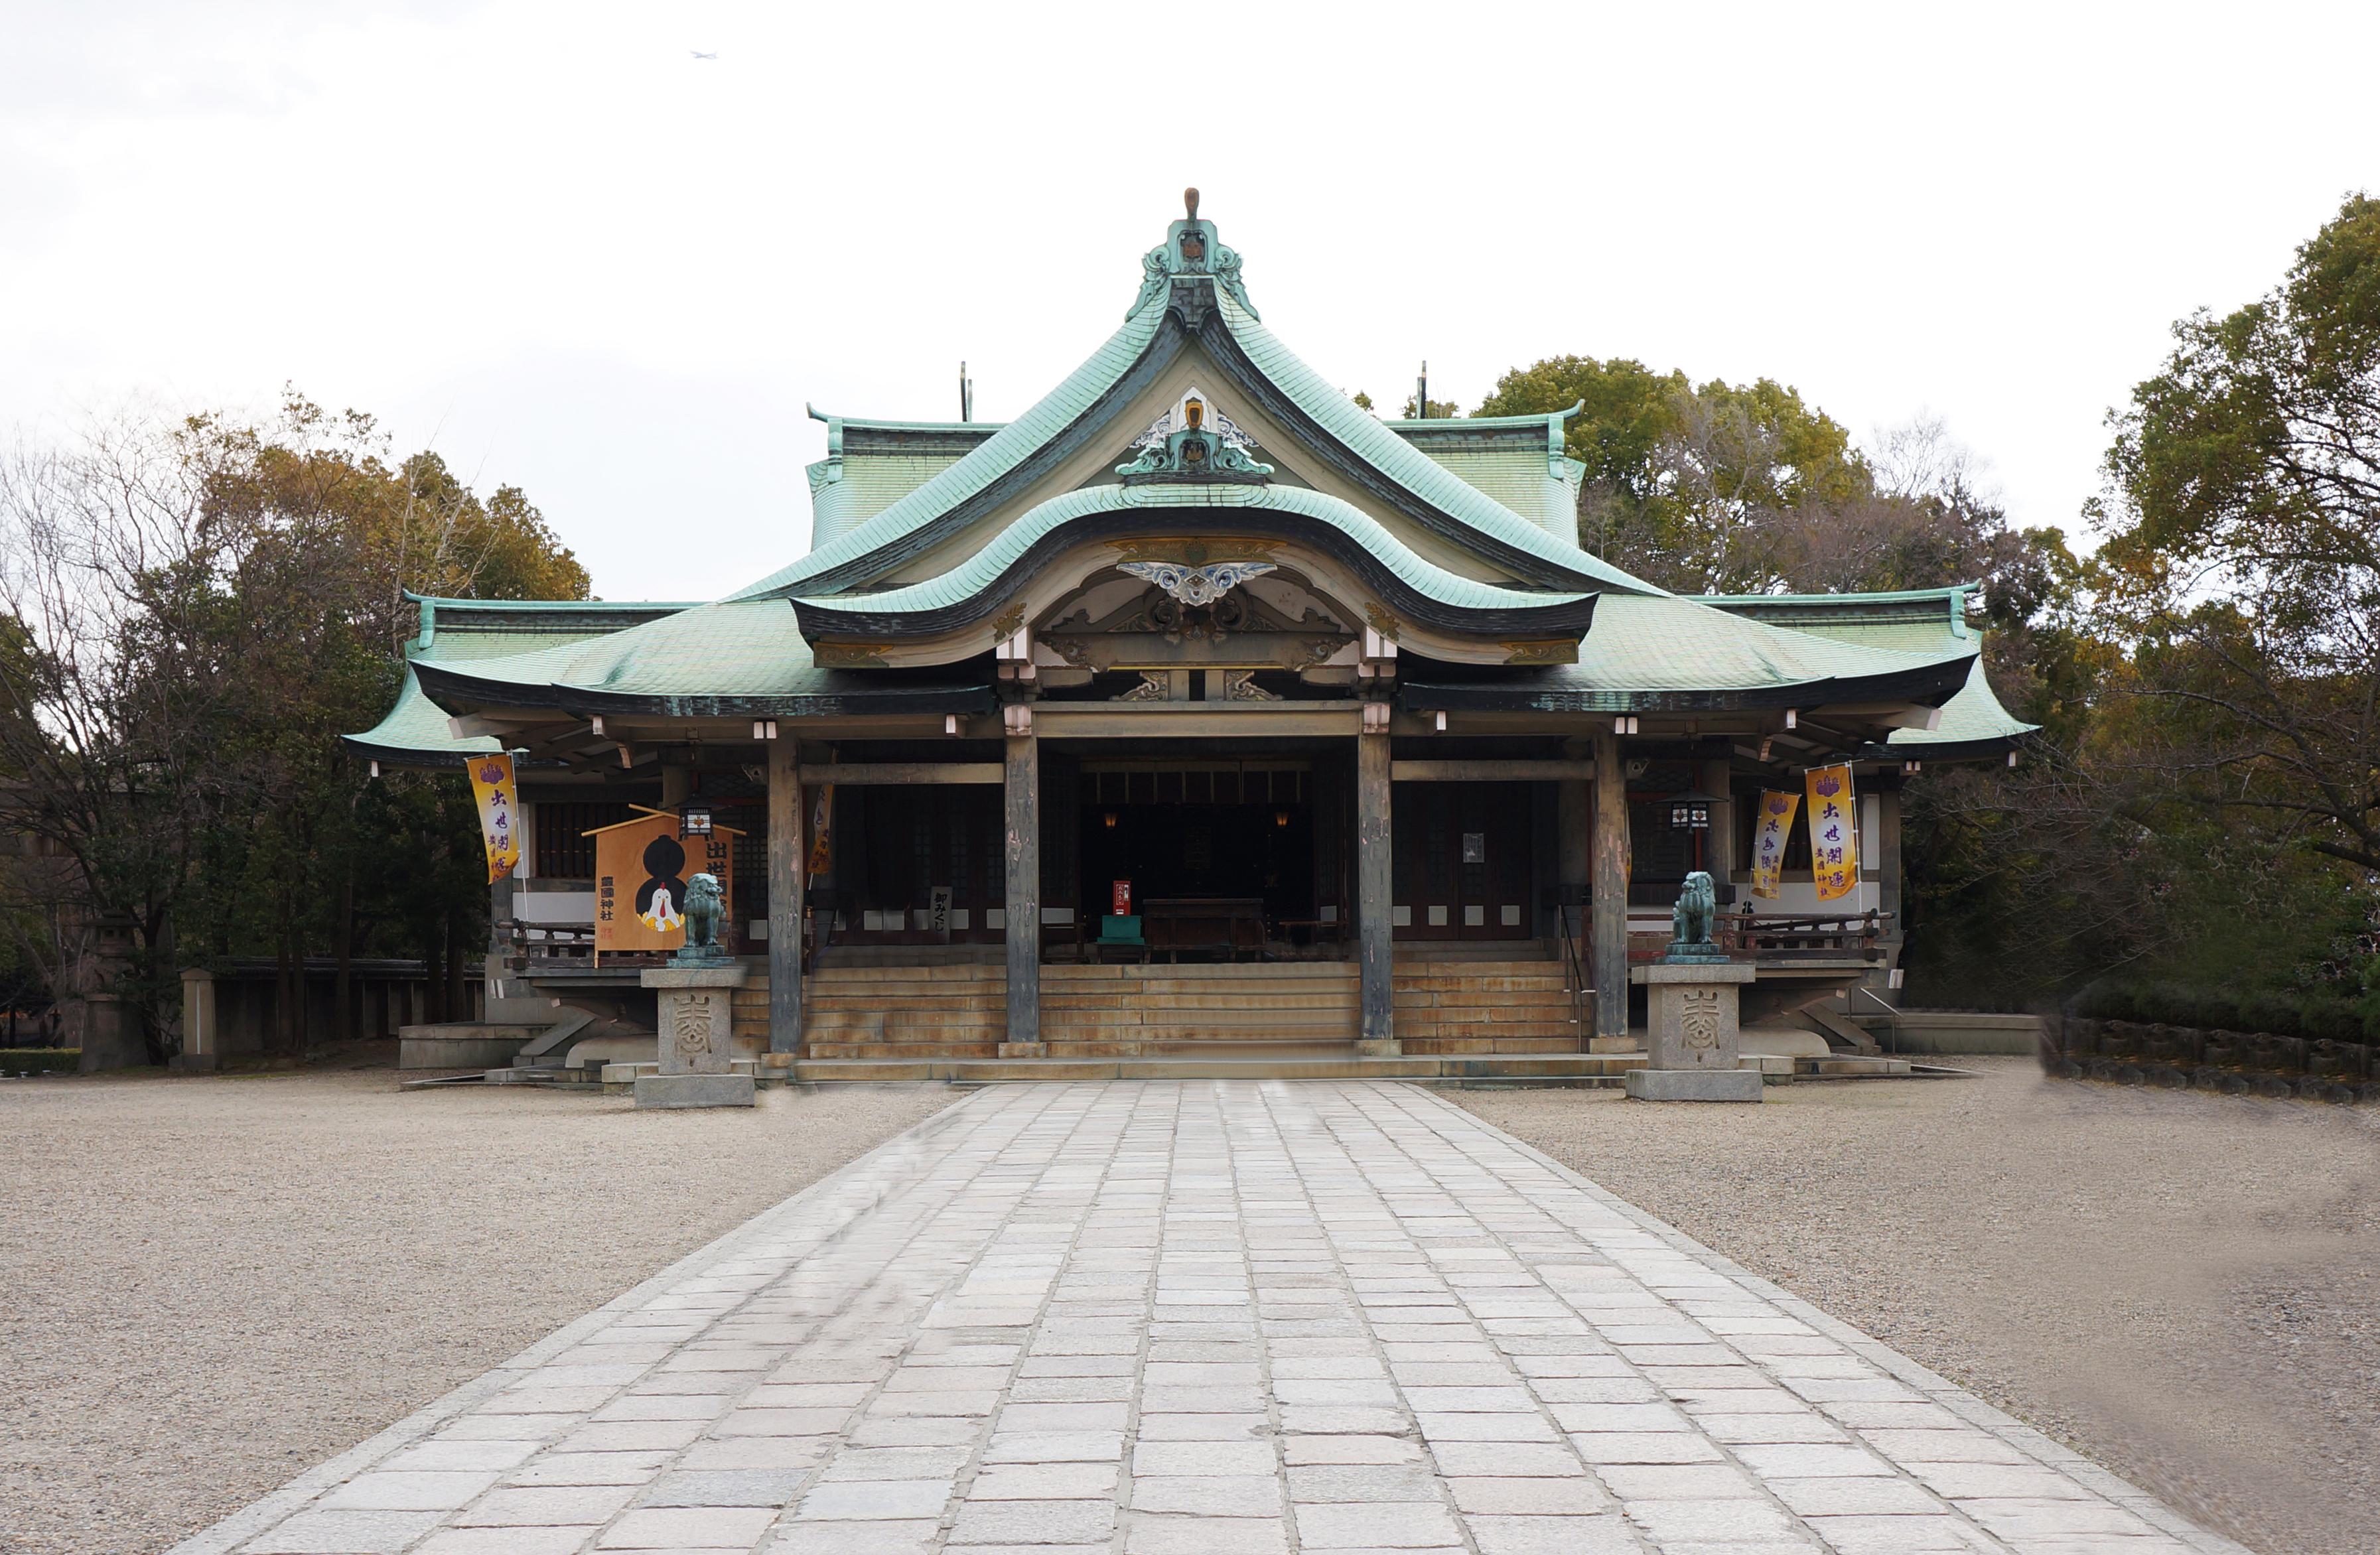 大阪城 豊國神社挙式プラン